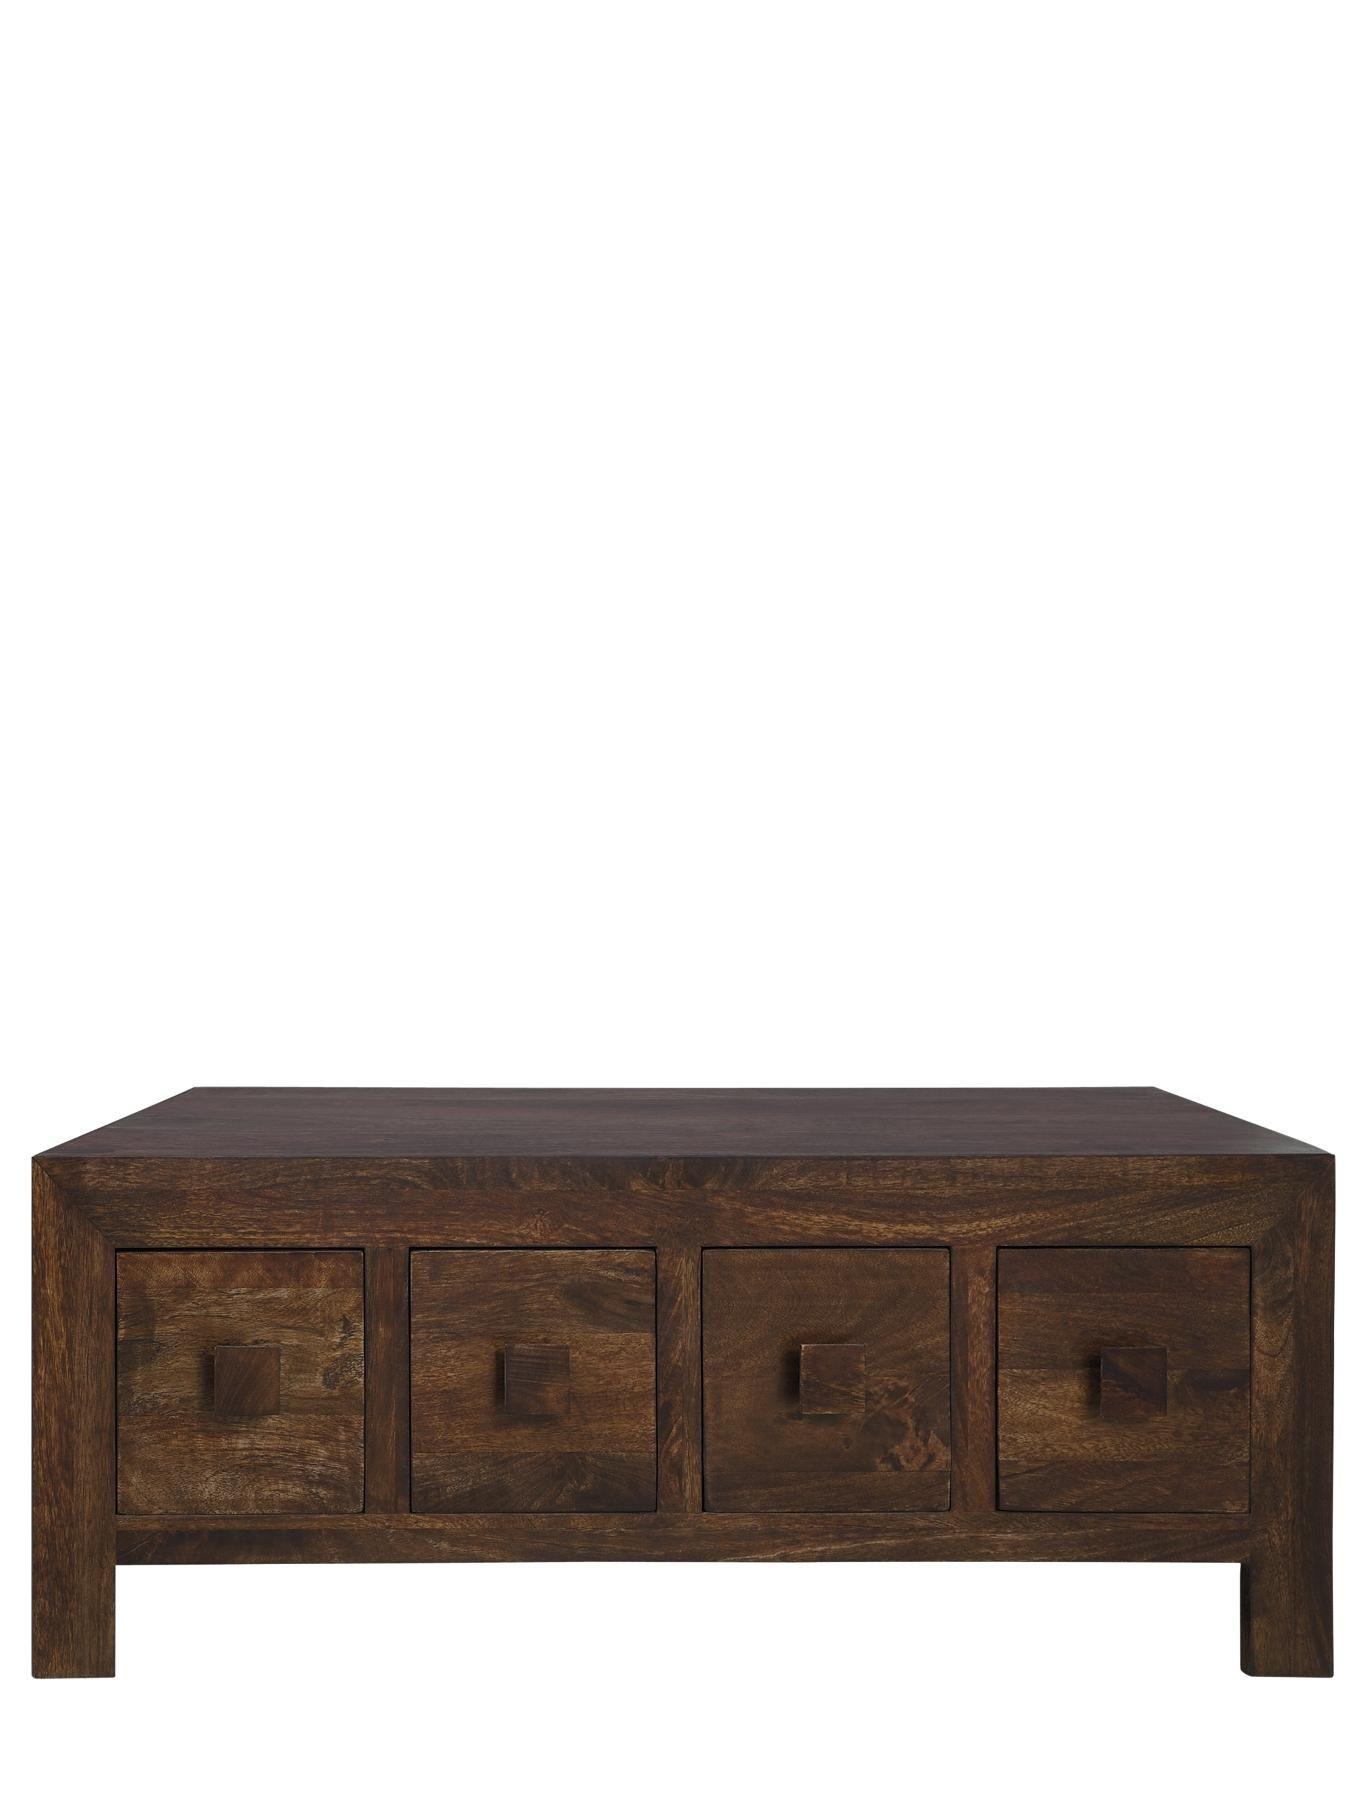 Beautiful Dark Wood Coffee Table Dark Wood Coffee Table Coffee Table Wood Coffee Table With Drawers [ 827 x 1103 Pixel ]